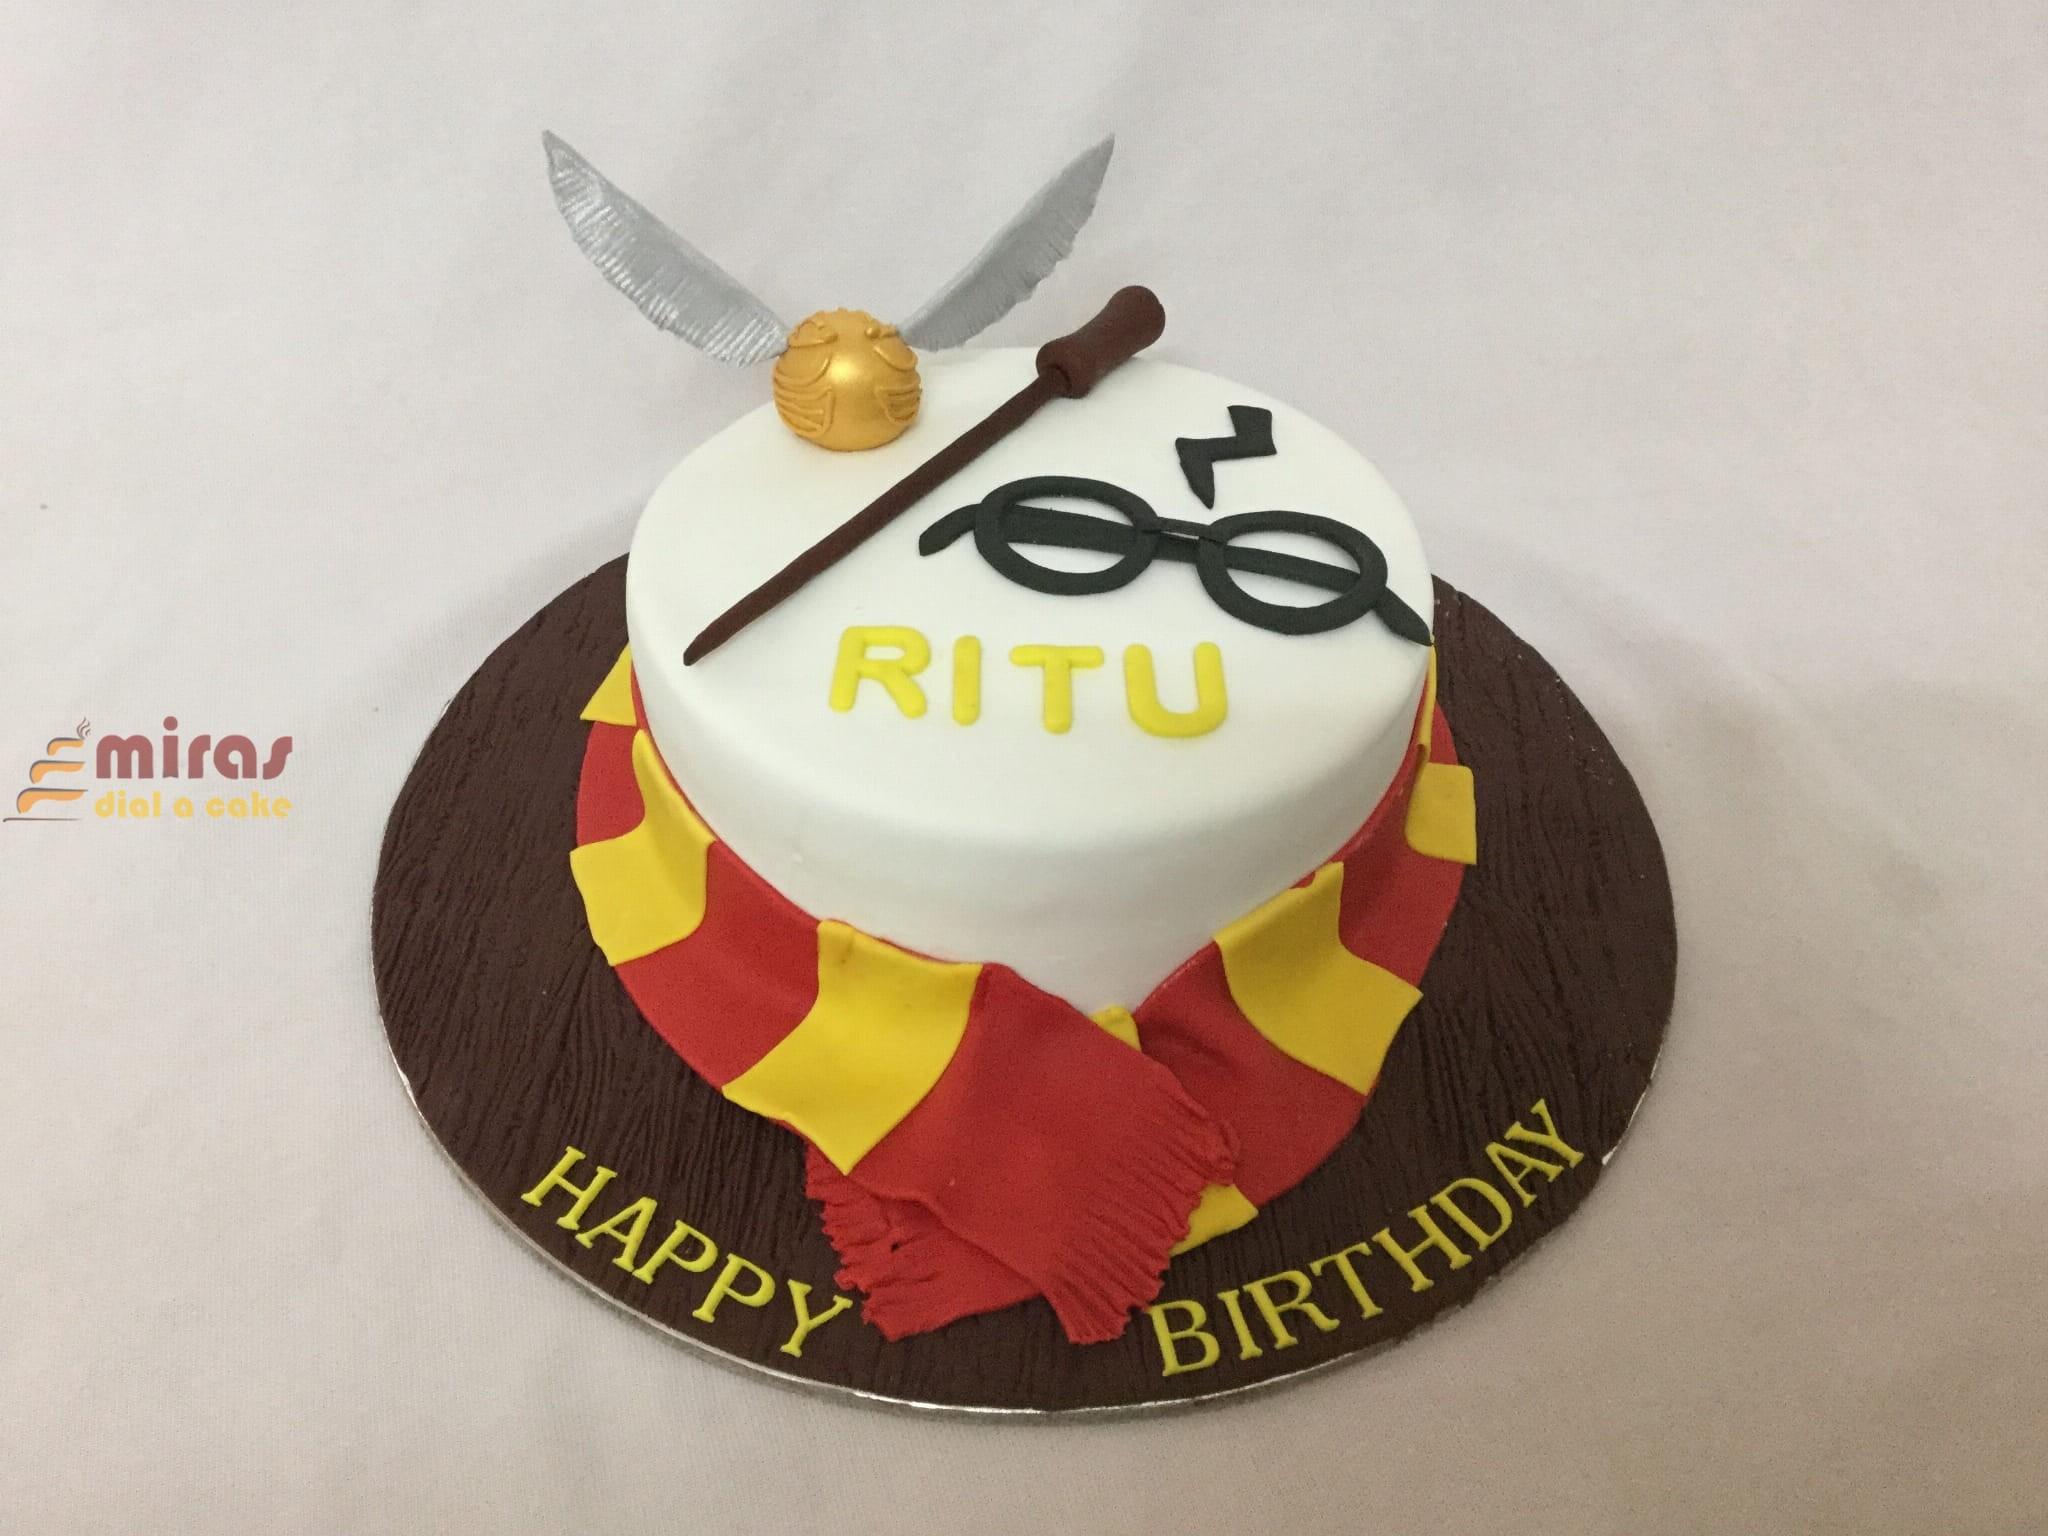 Wondrous Customized Theme Cakes For Birthday Wedding Anniversary Baby Funny Birthday Cards Online Elaedamsfinfo